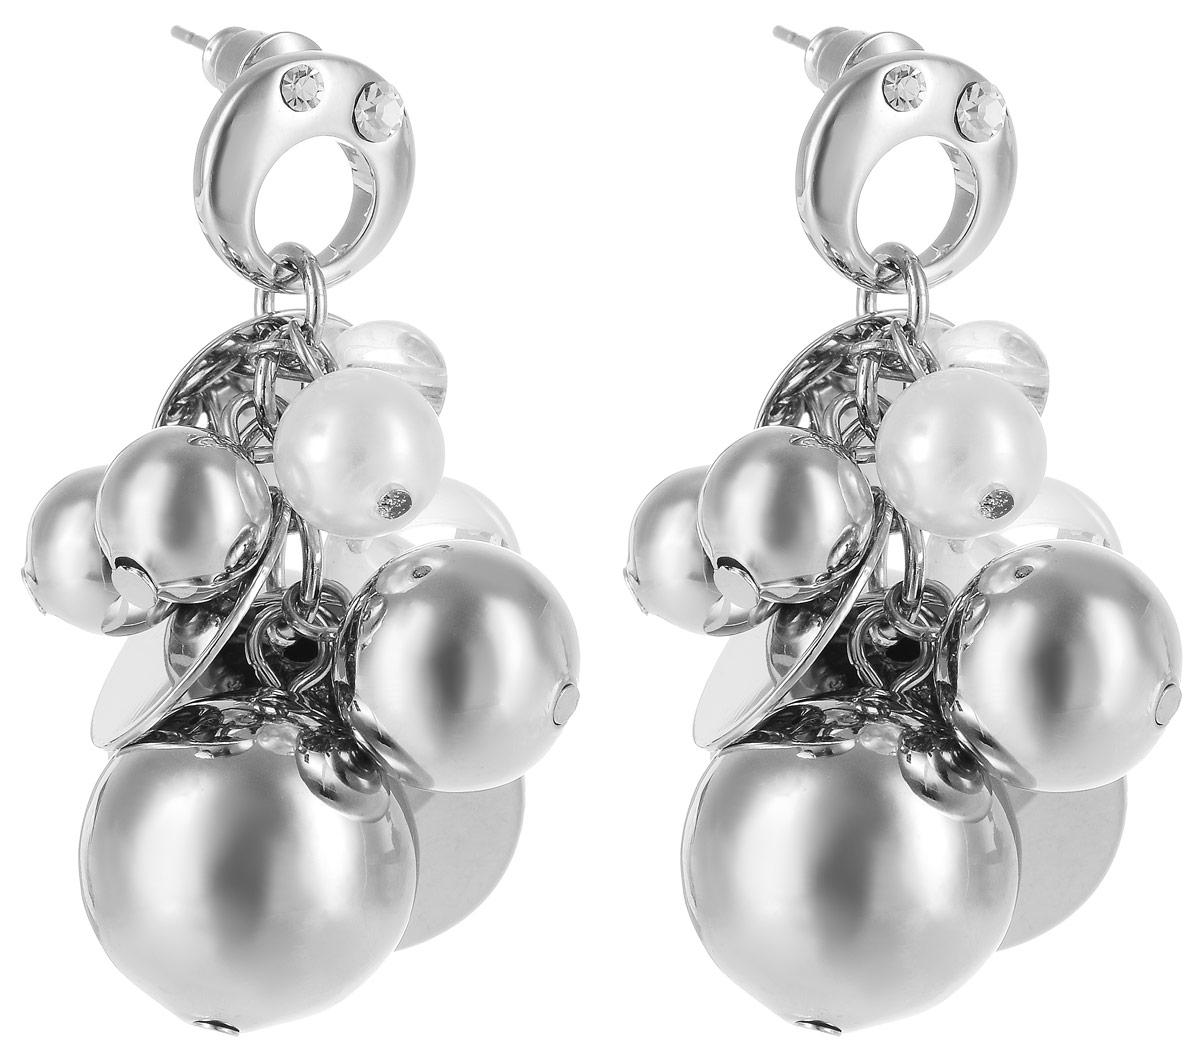 Серьги Art-Silver, цвет: серебряный. СРГ107-482СРГ107-482Бижутерный сплав, юв.пластик, майорика.